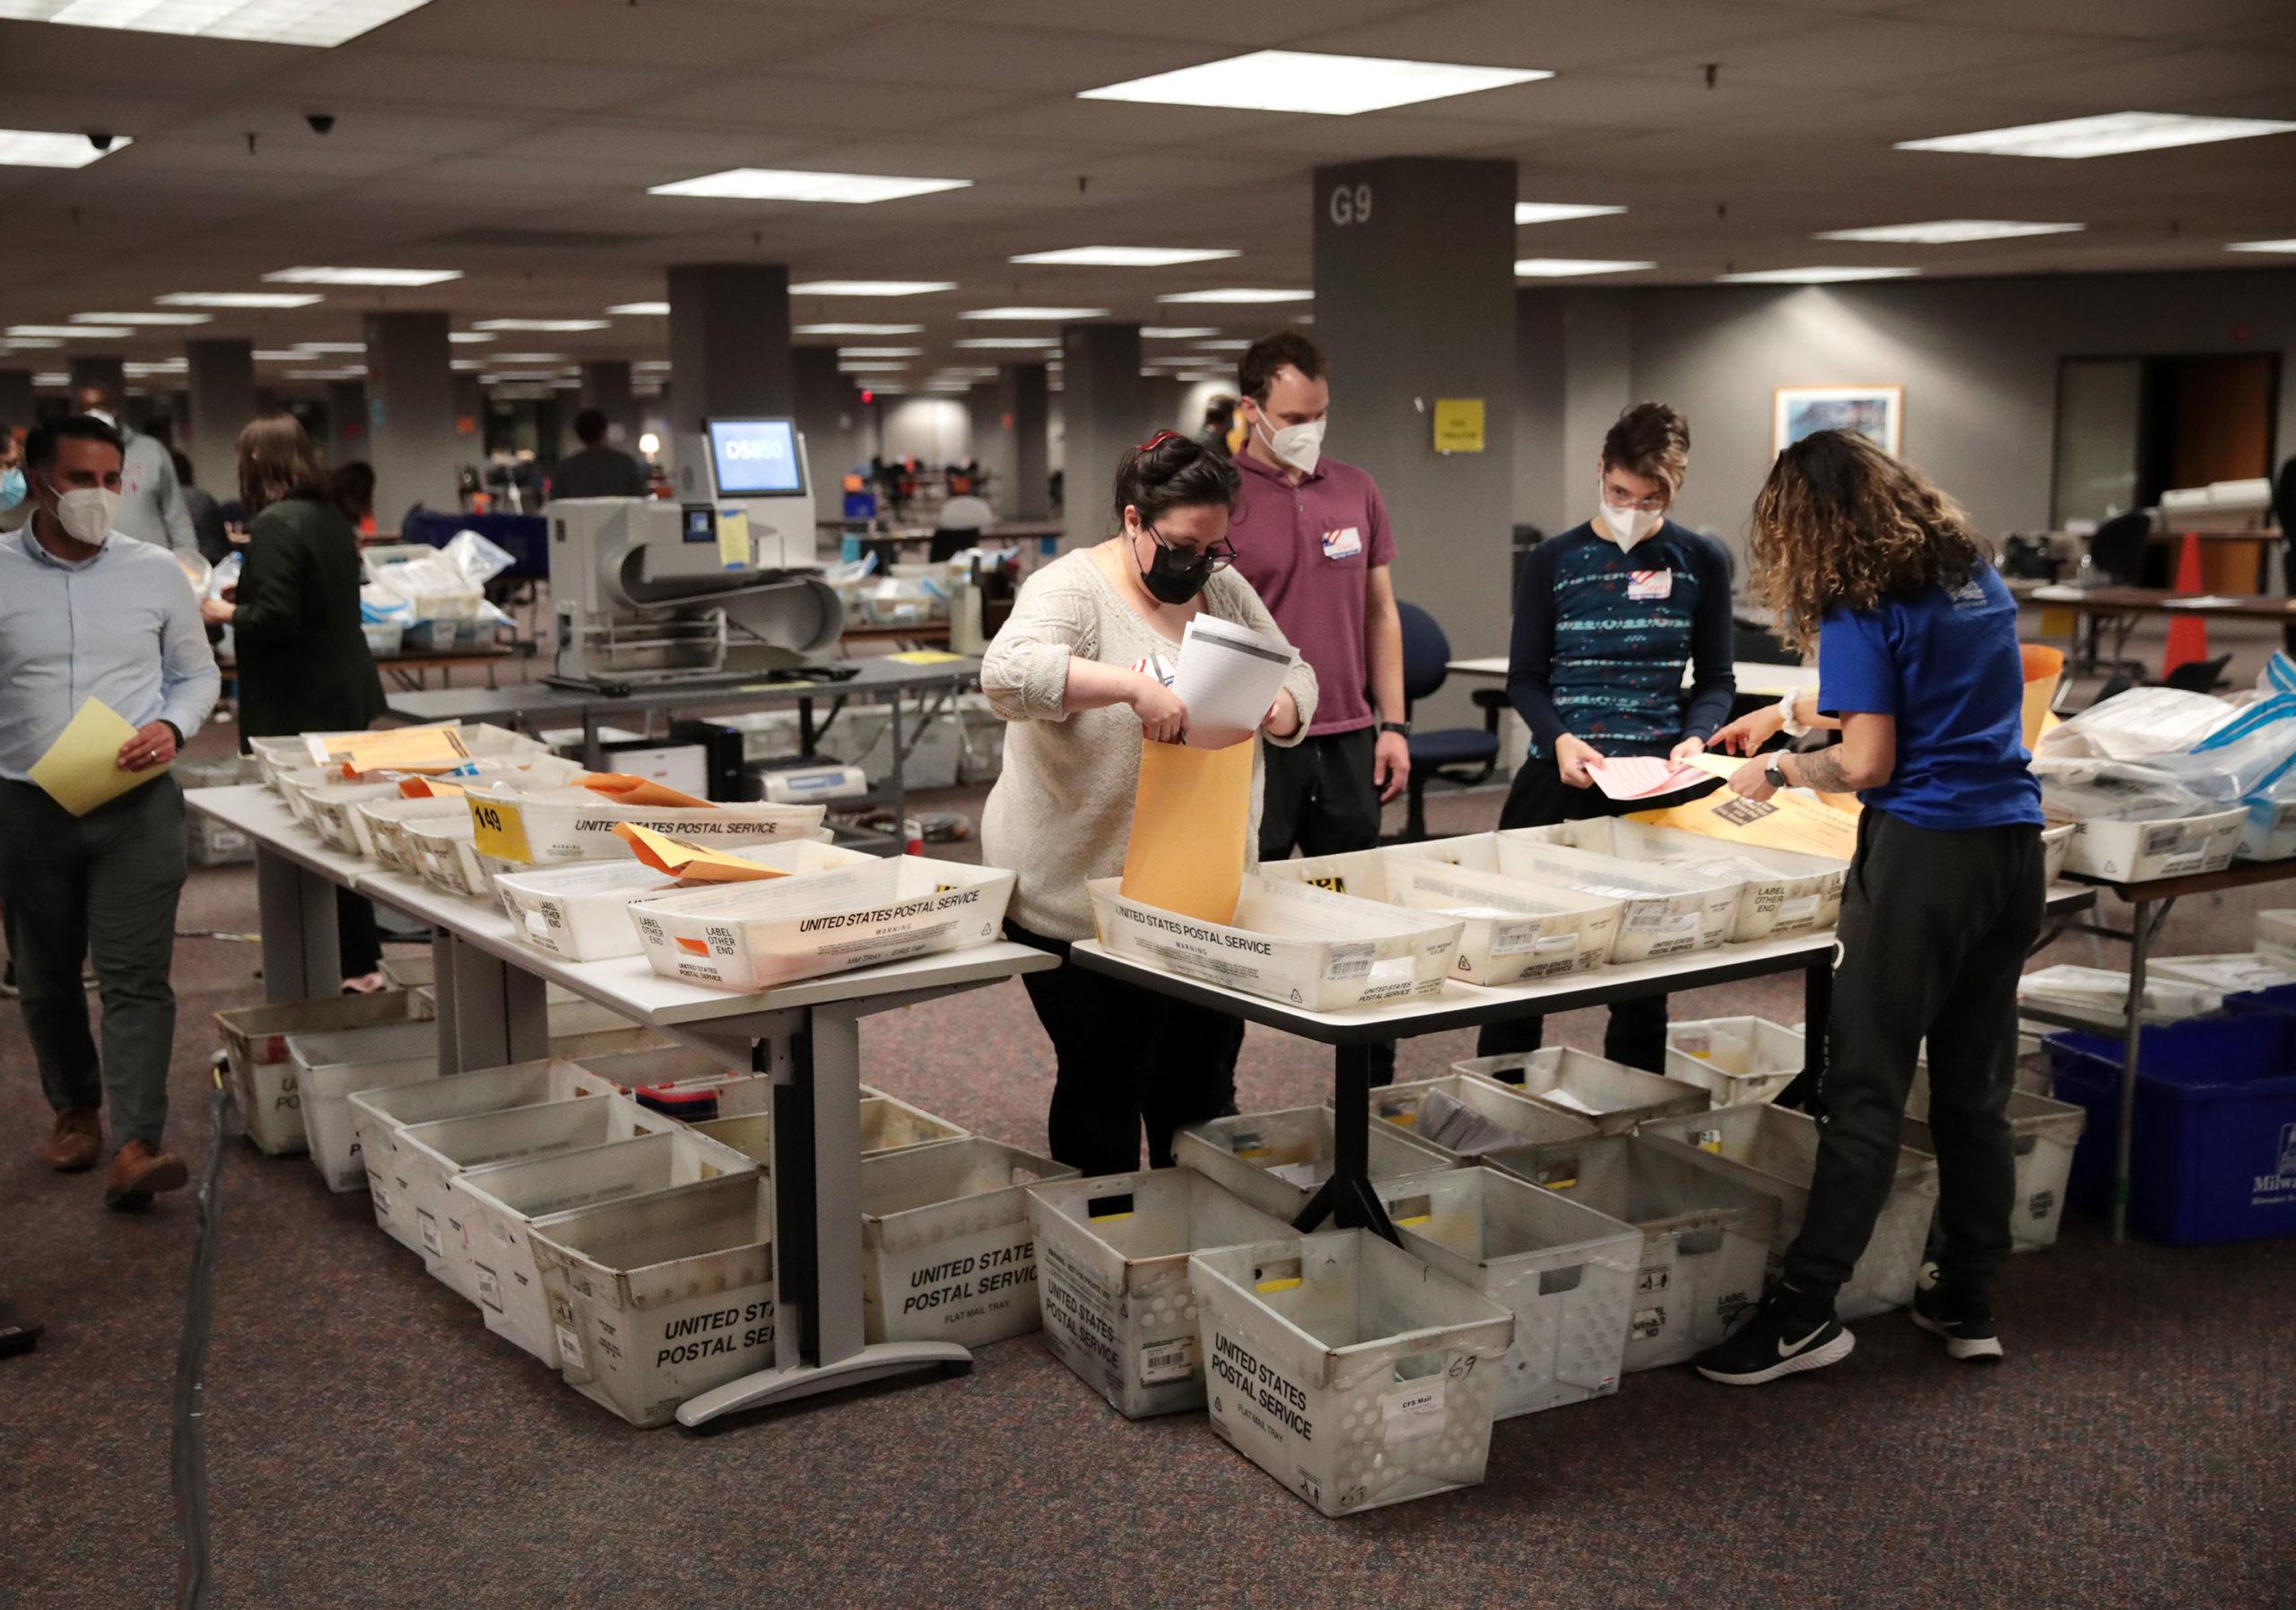 Zgjedhjet presidenciale, Komisioni zgjedhor i Wisconsin urdhëron zyrtarisht rinumërimin